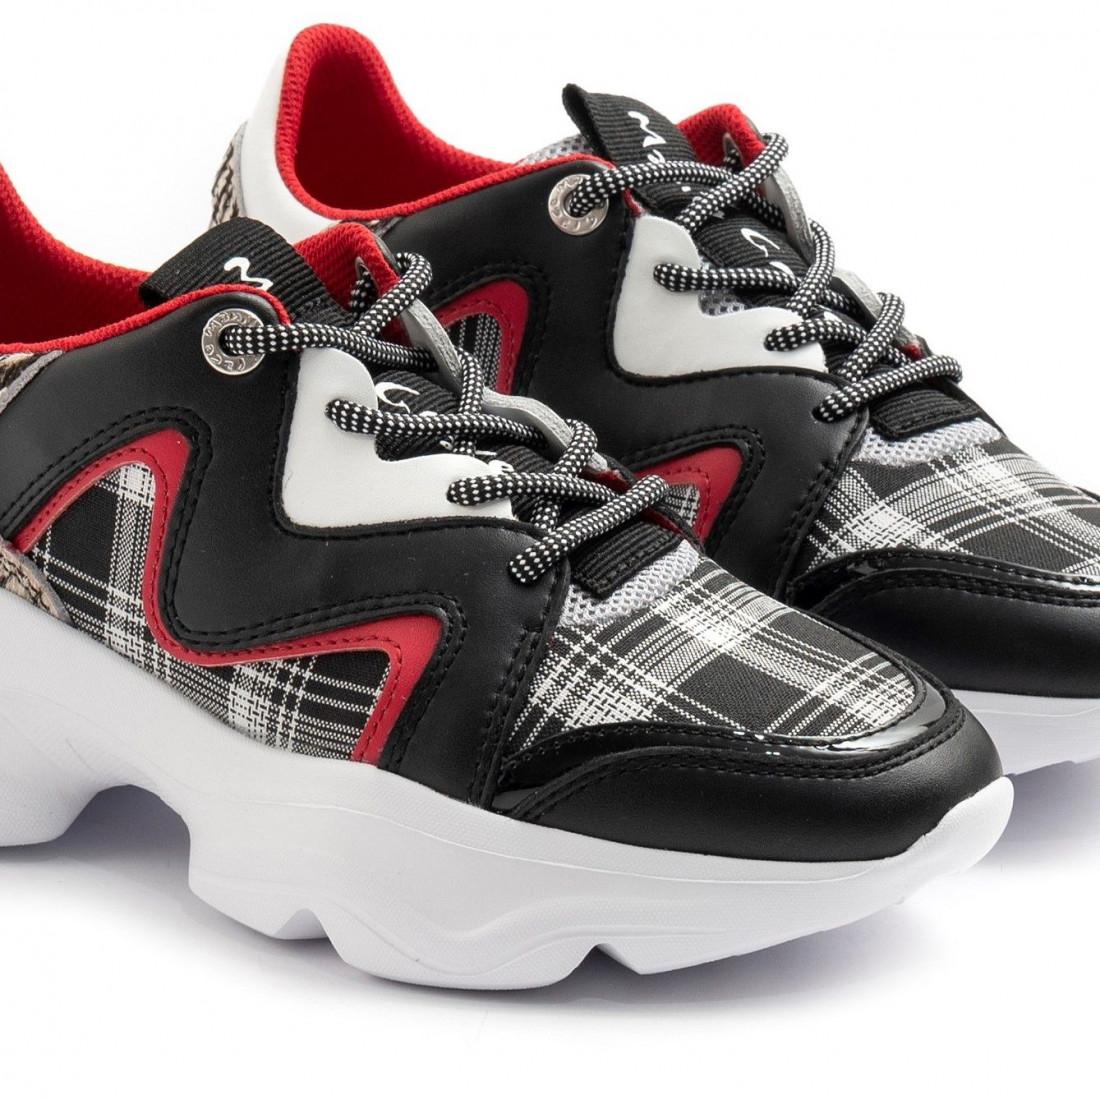 sneakers woman manila grace s009lqmd927 7911